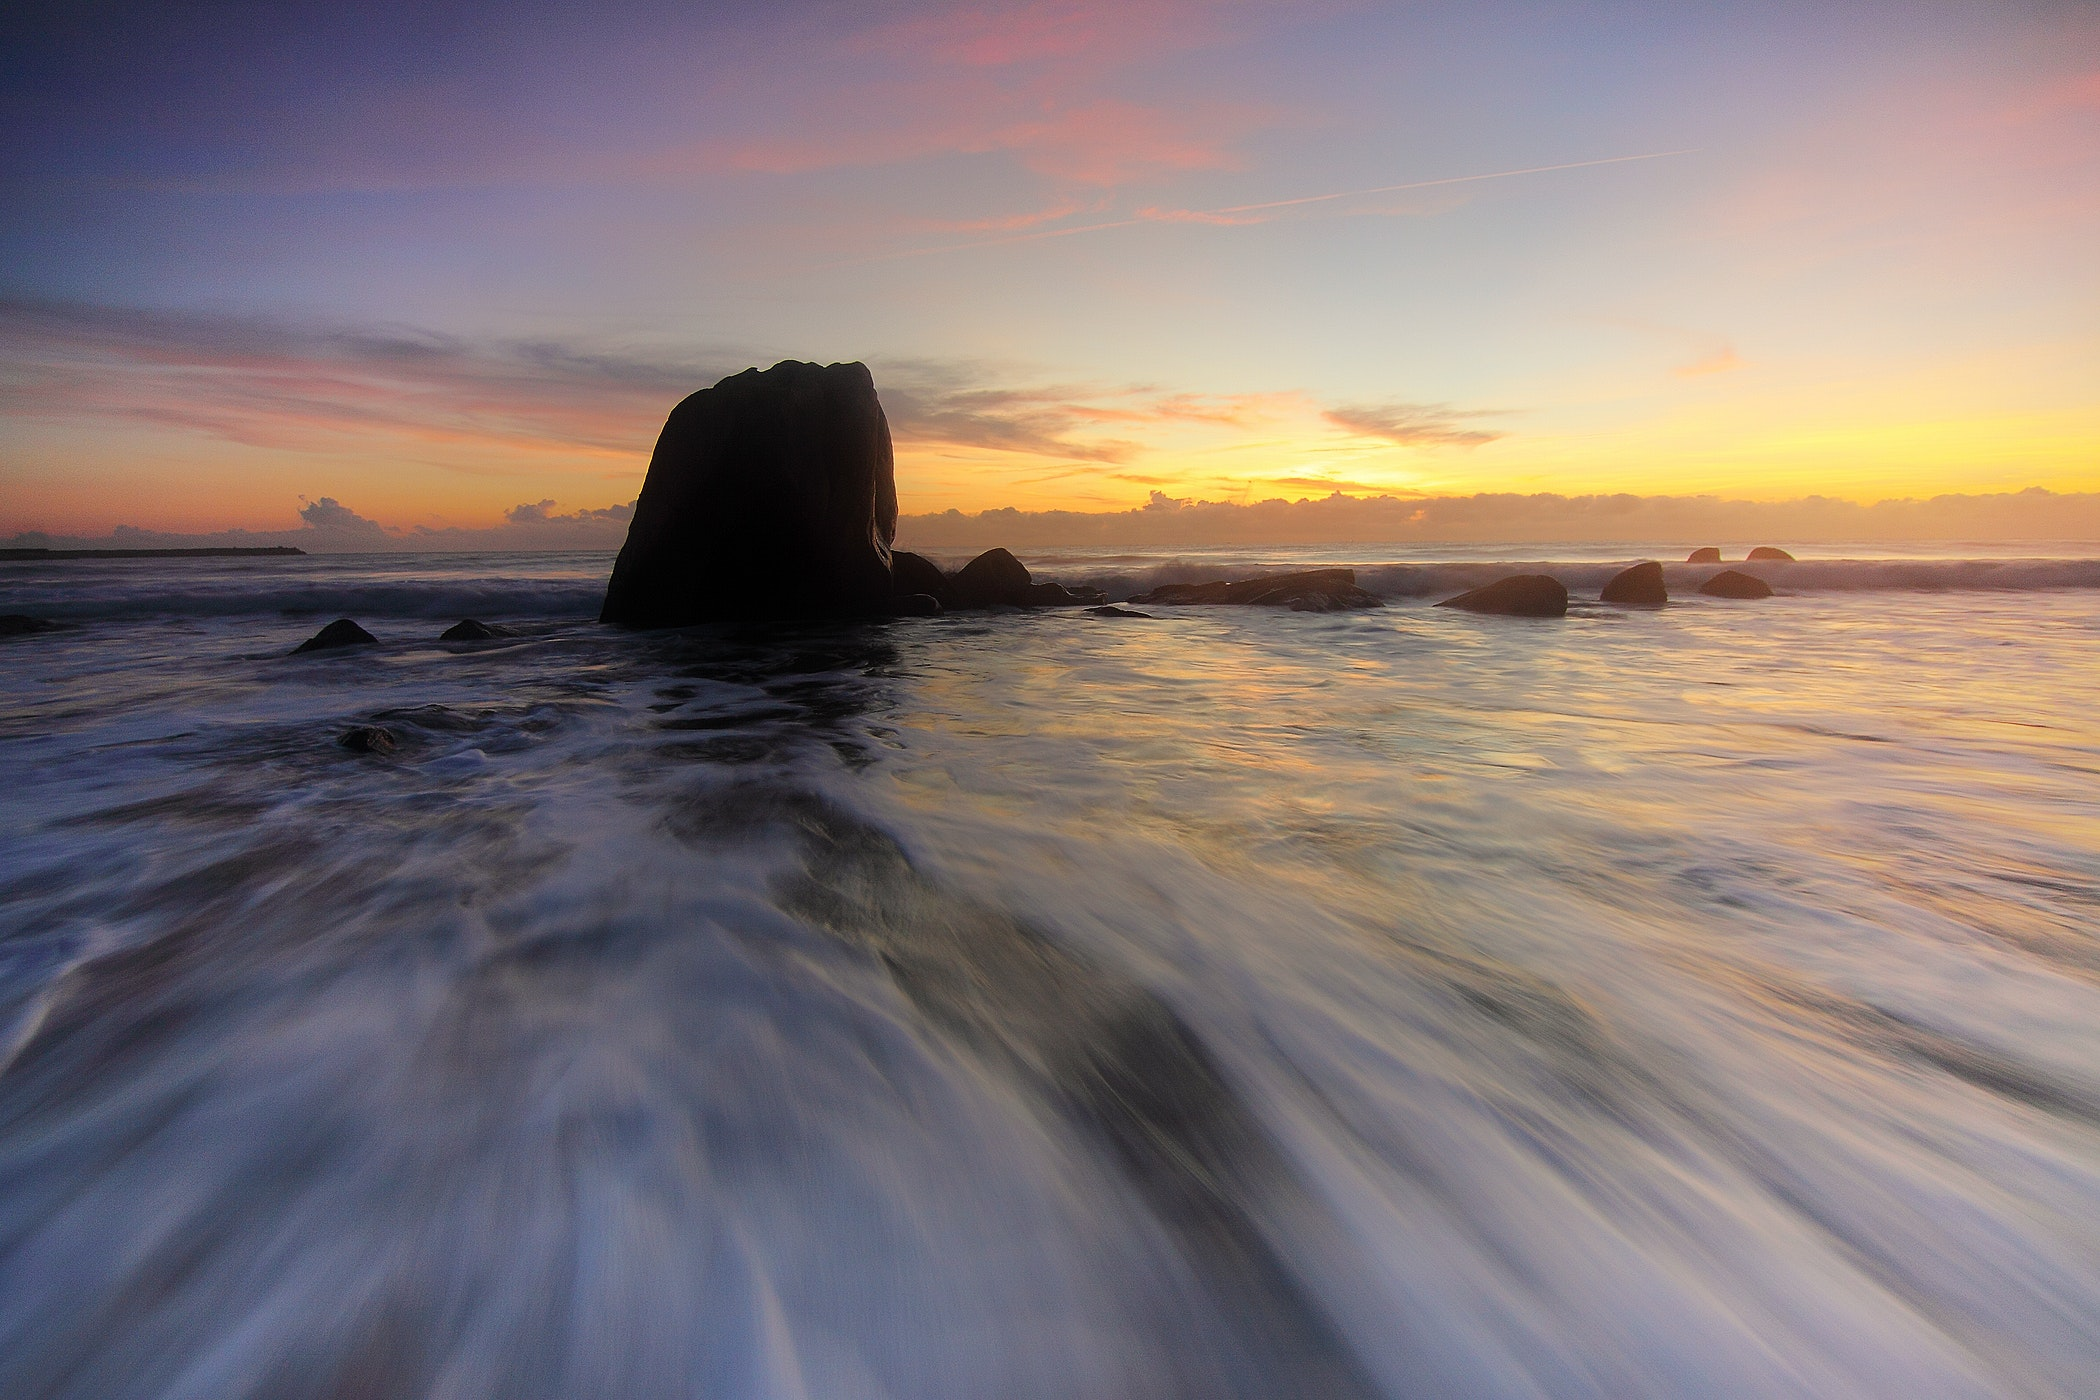 Rock on the Beach, Sun, Sky, Sunset, Seascape, HQ Photo